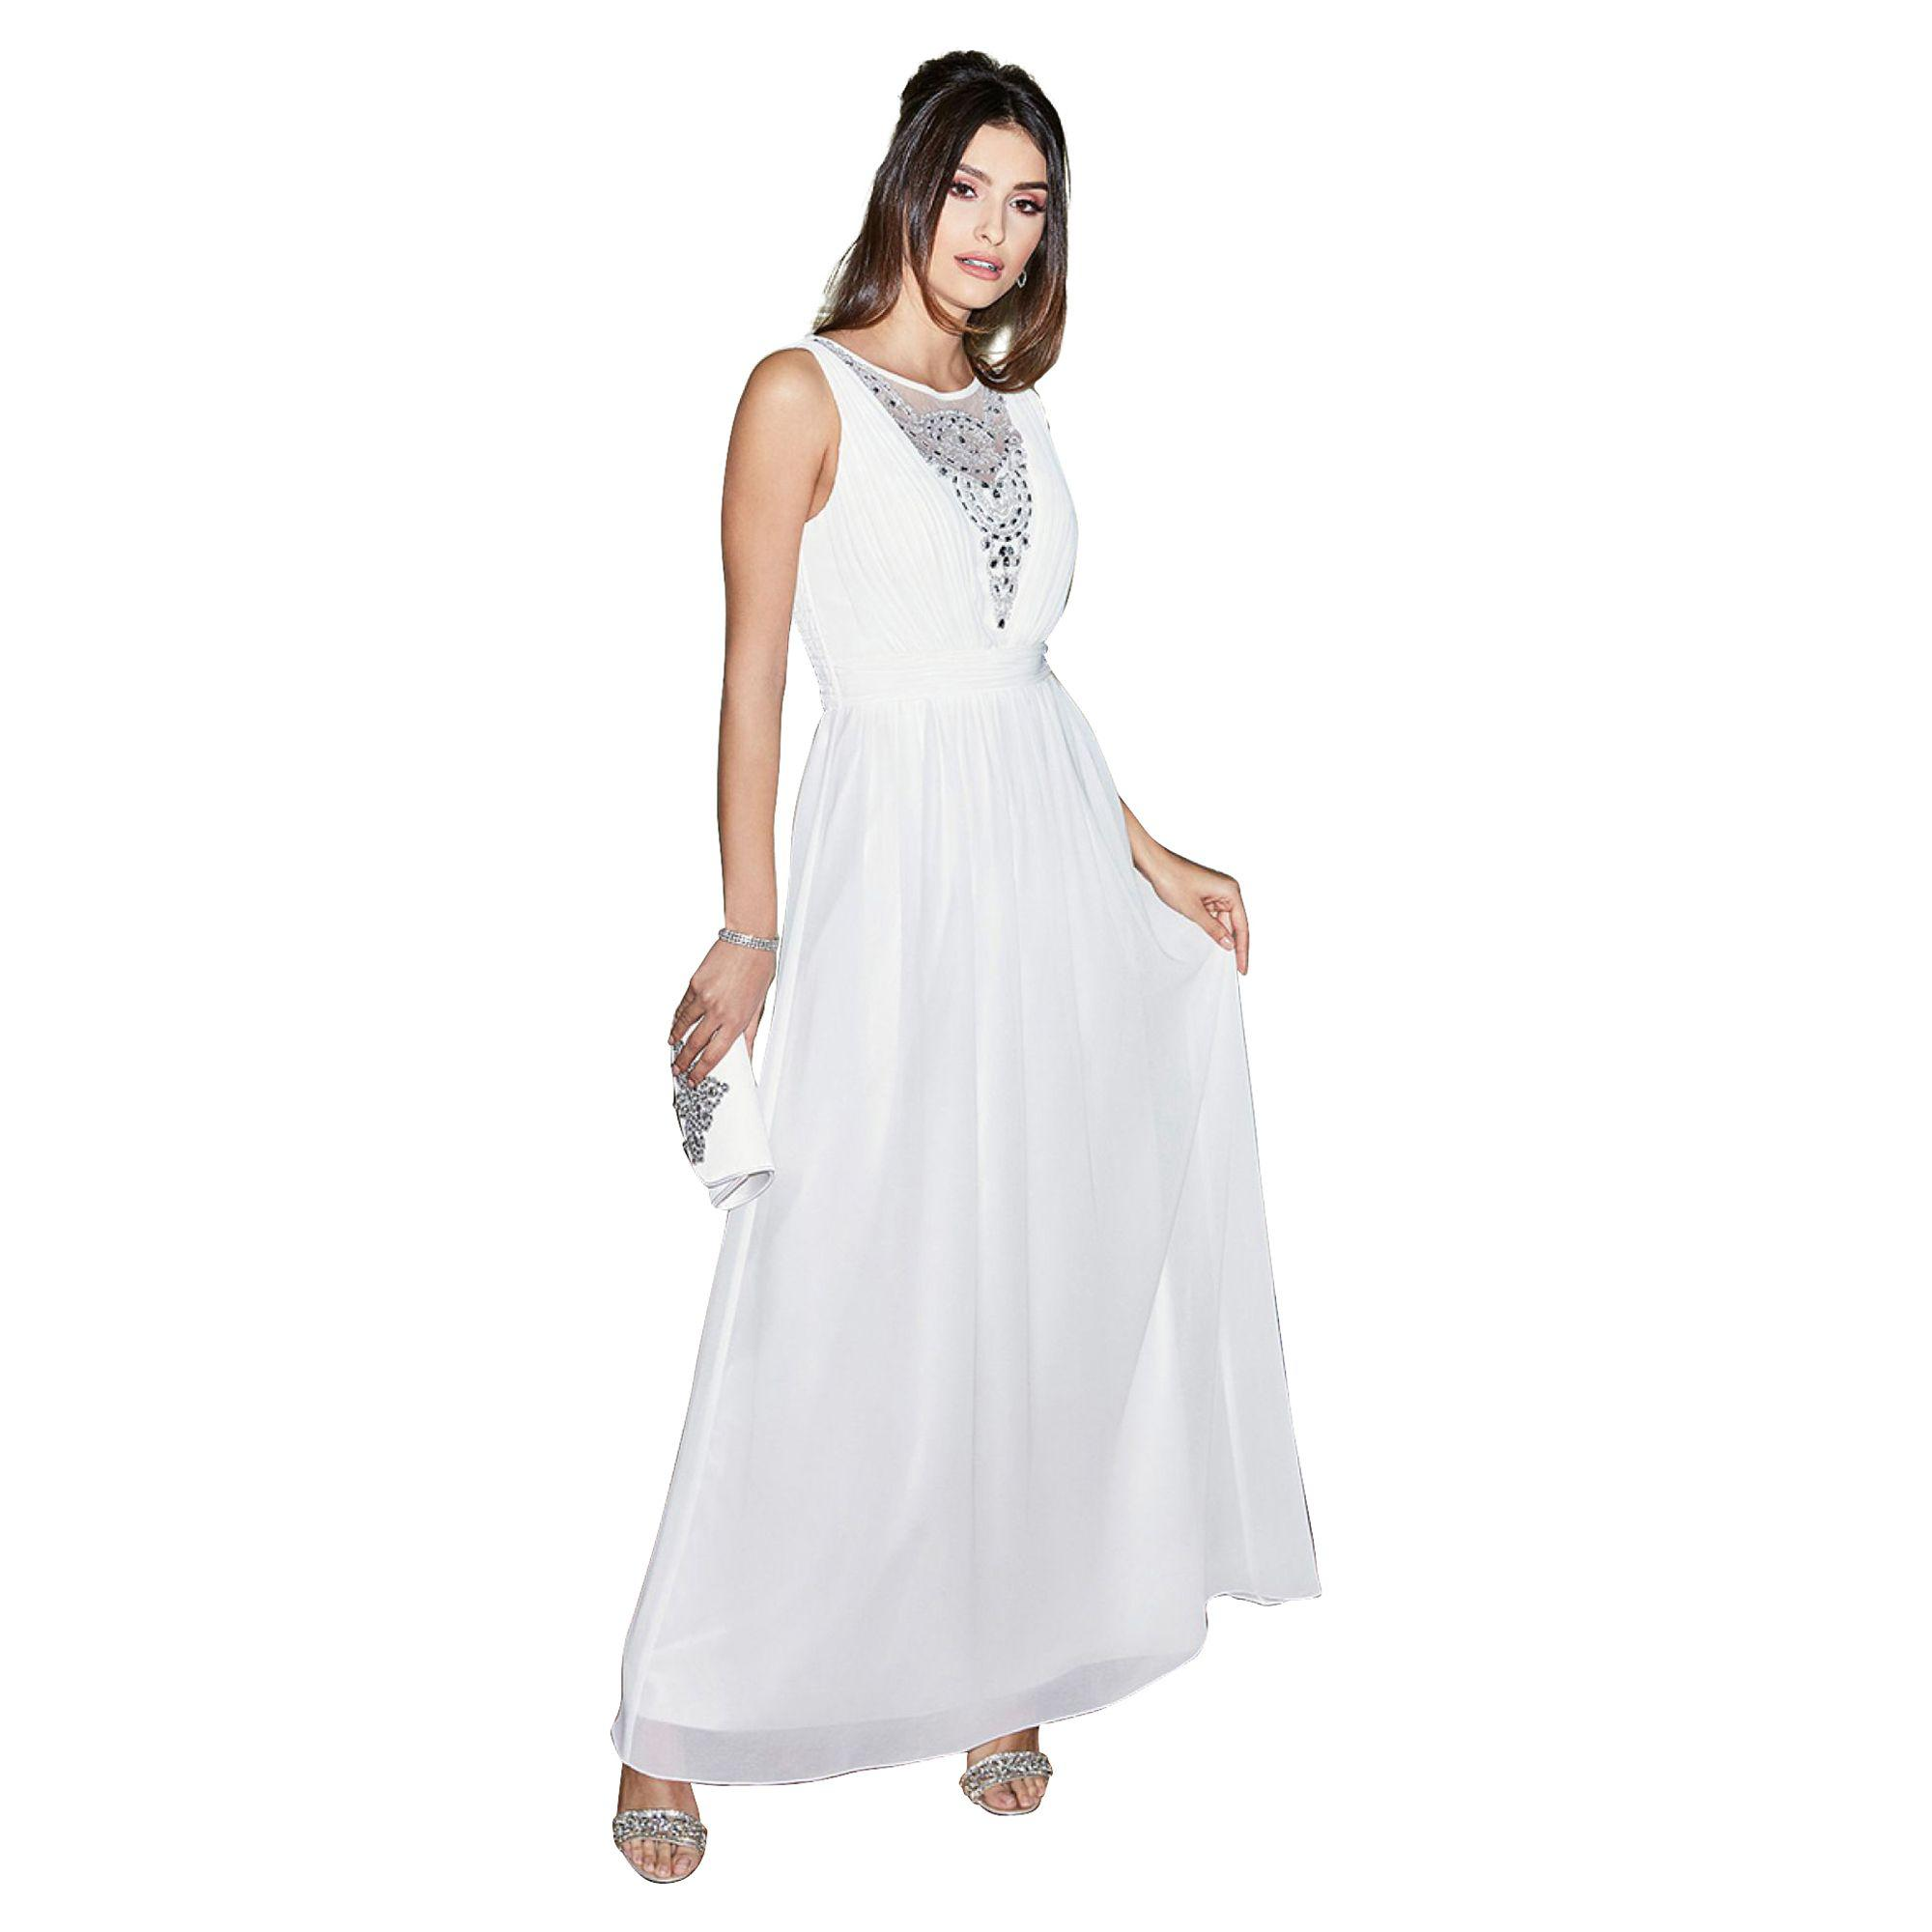 Quiz Ruby White Chiffon Diamante Bridal Dress in White - Lyst